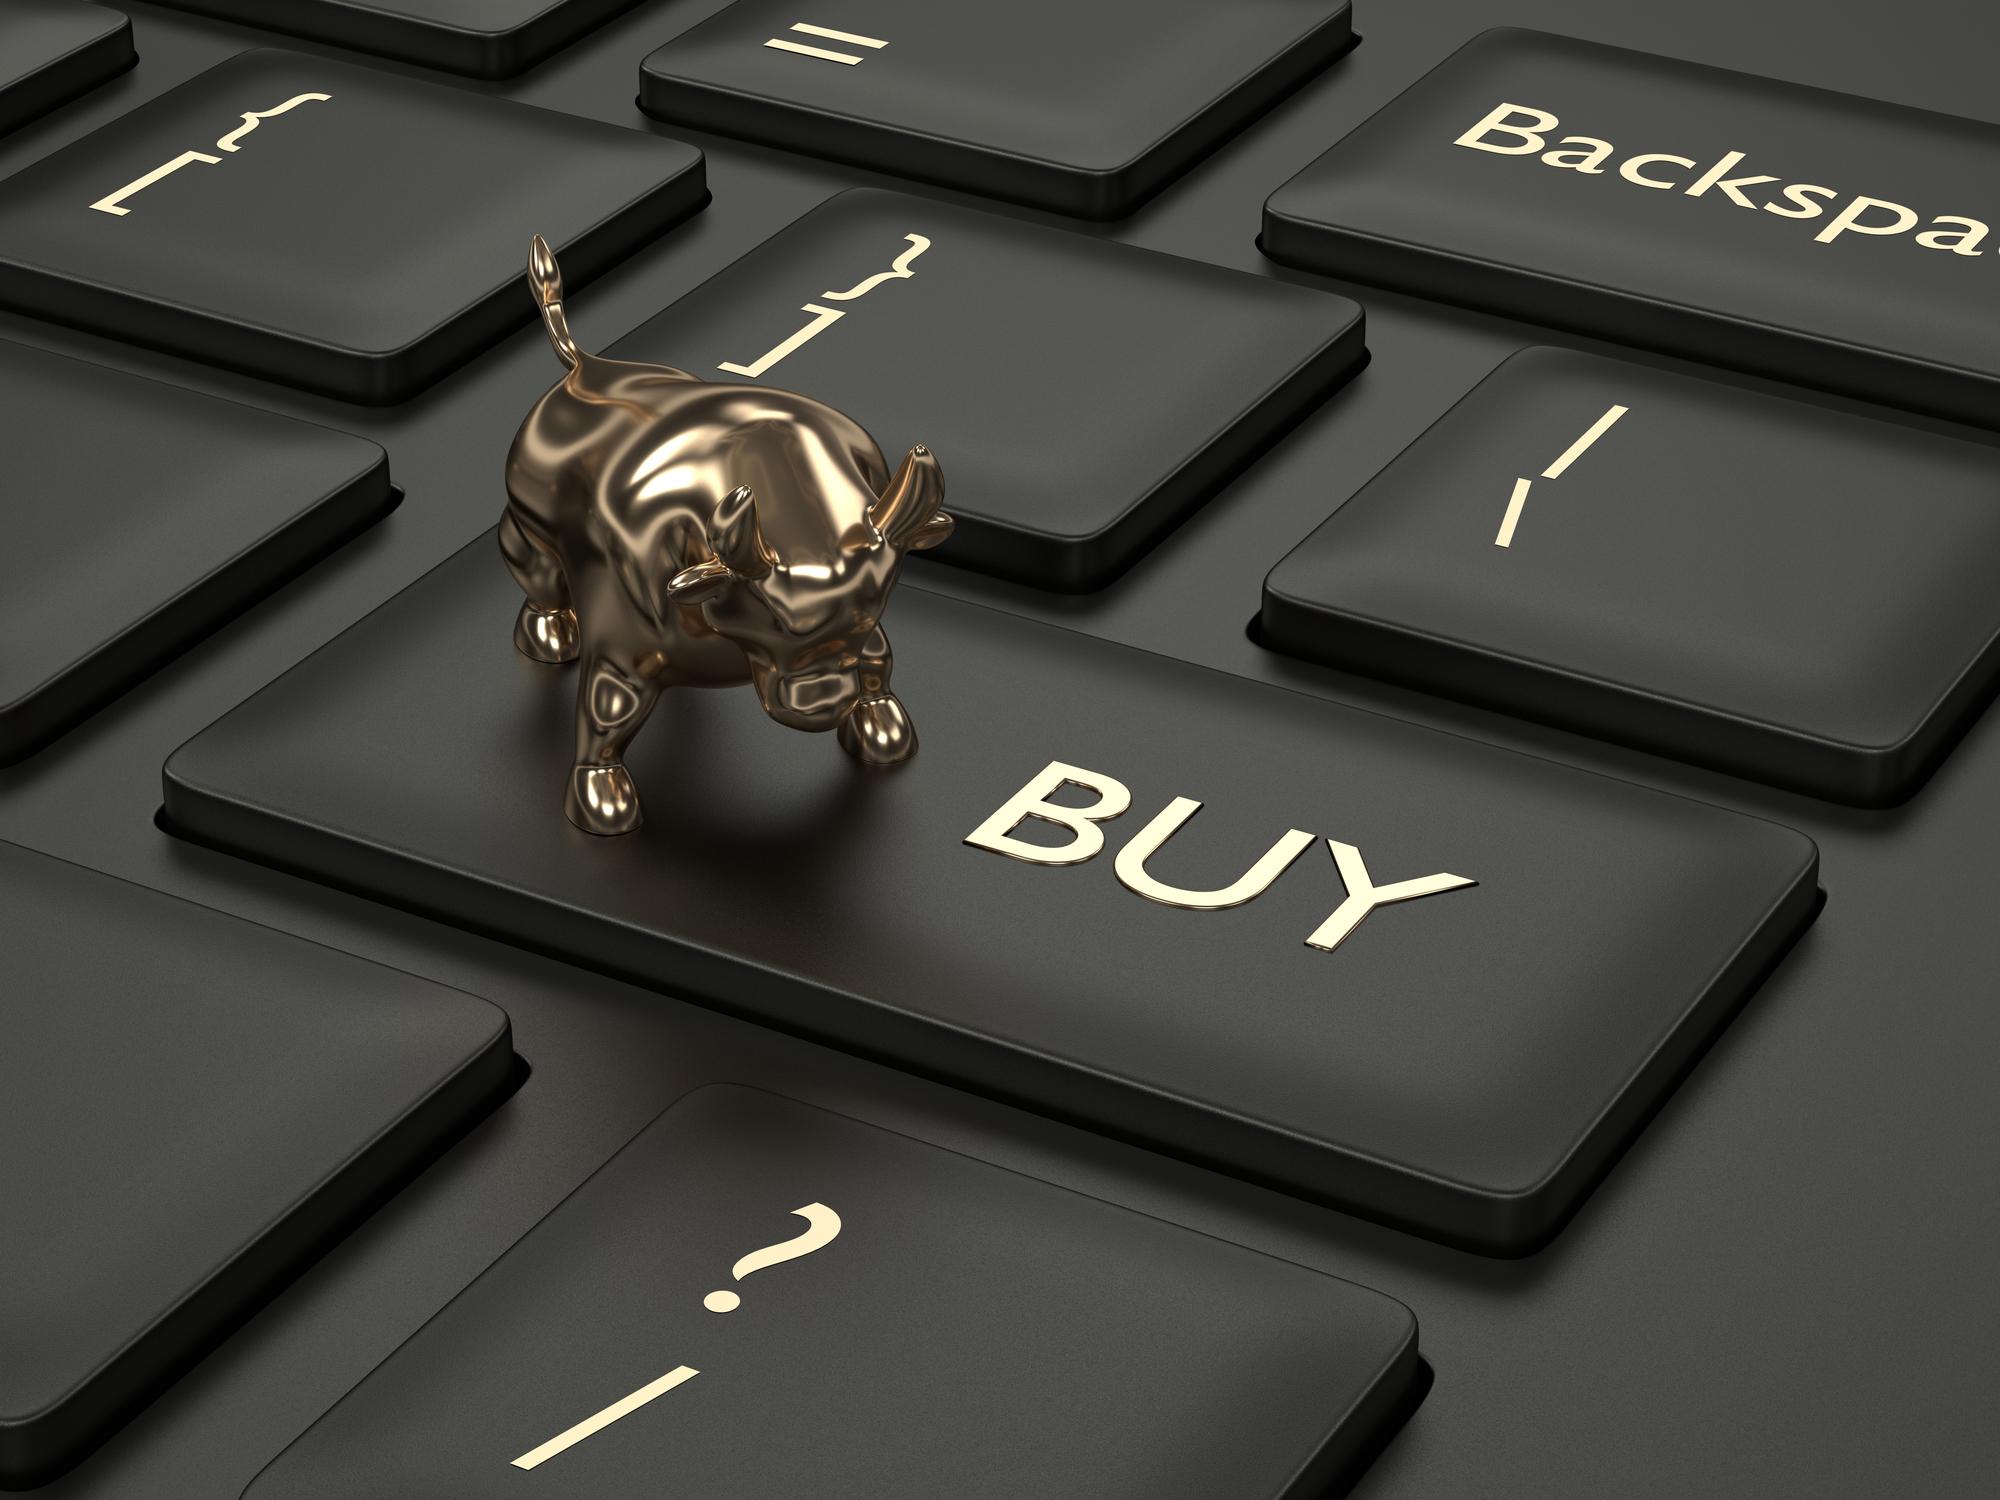 Why Nvidia Stock Climbed 7.7% This Week